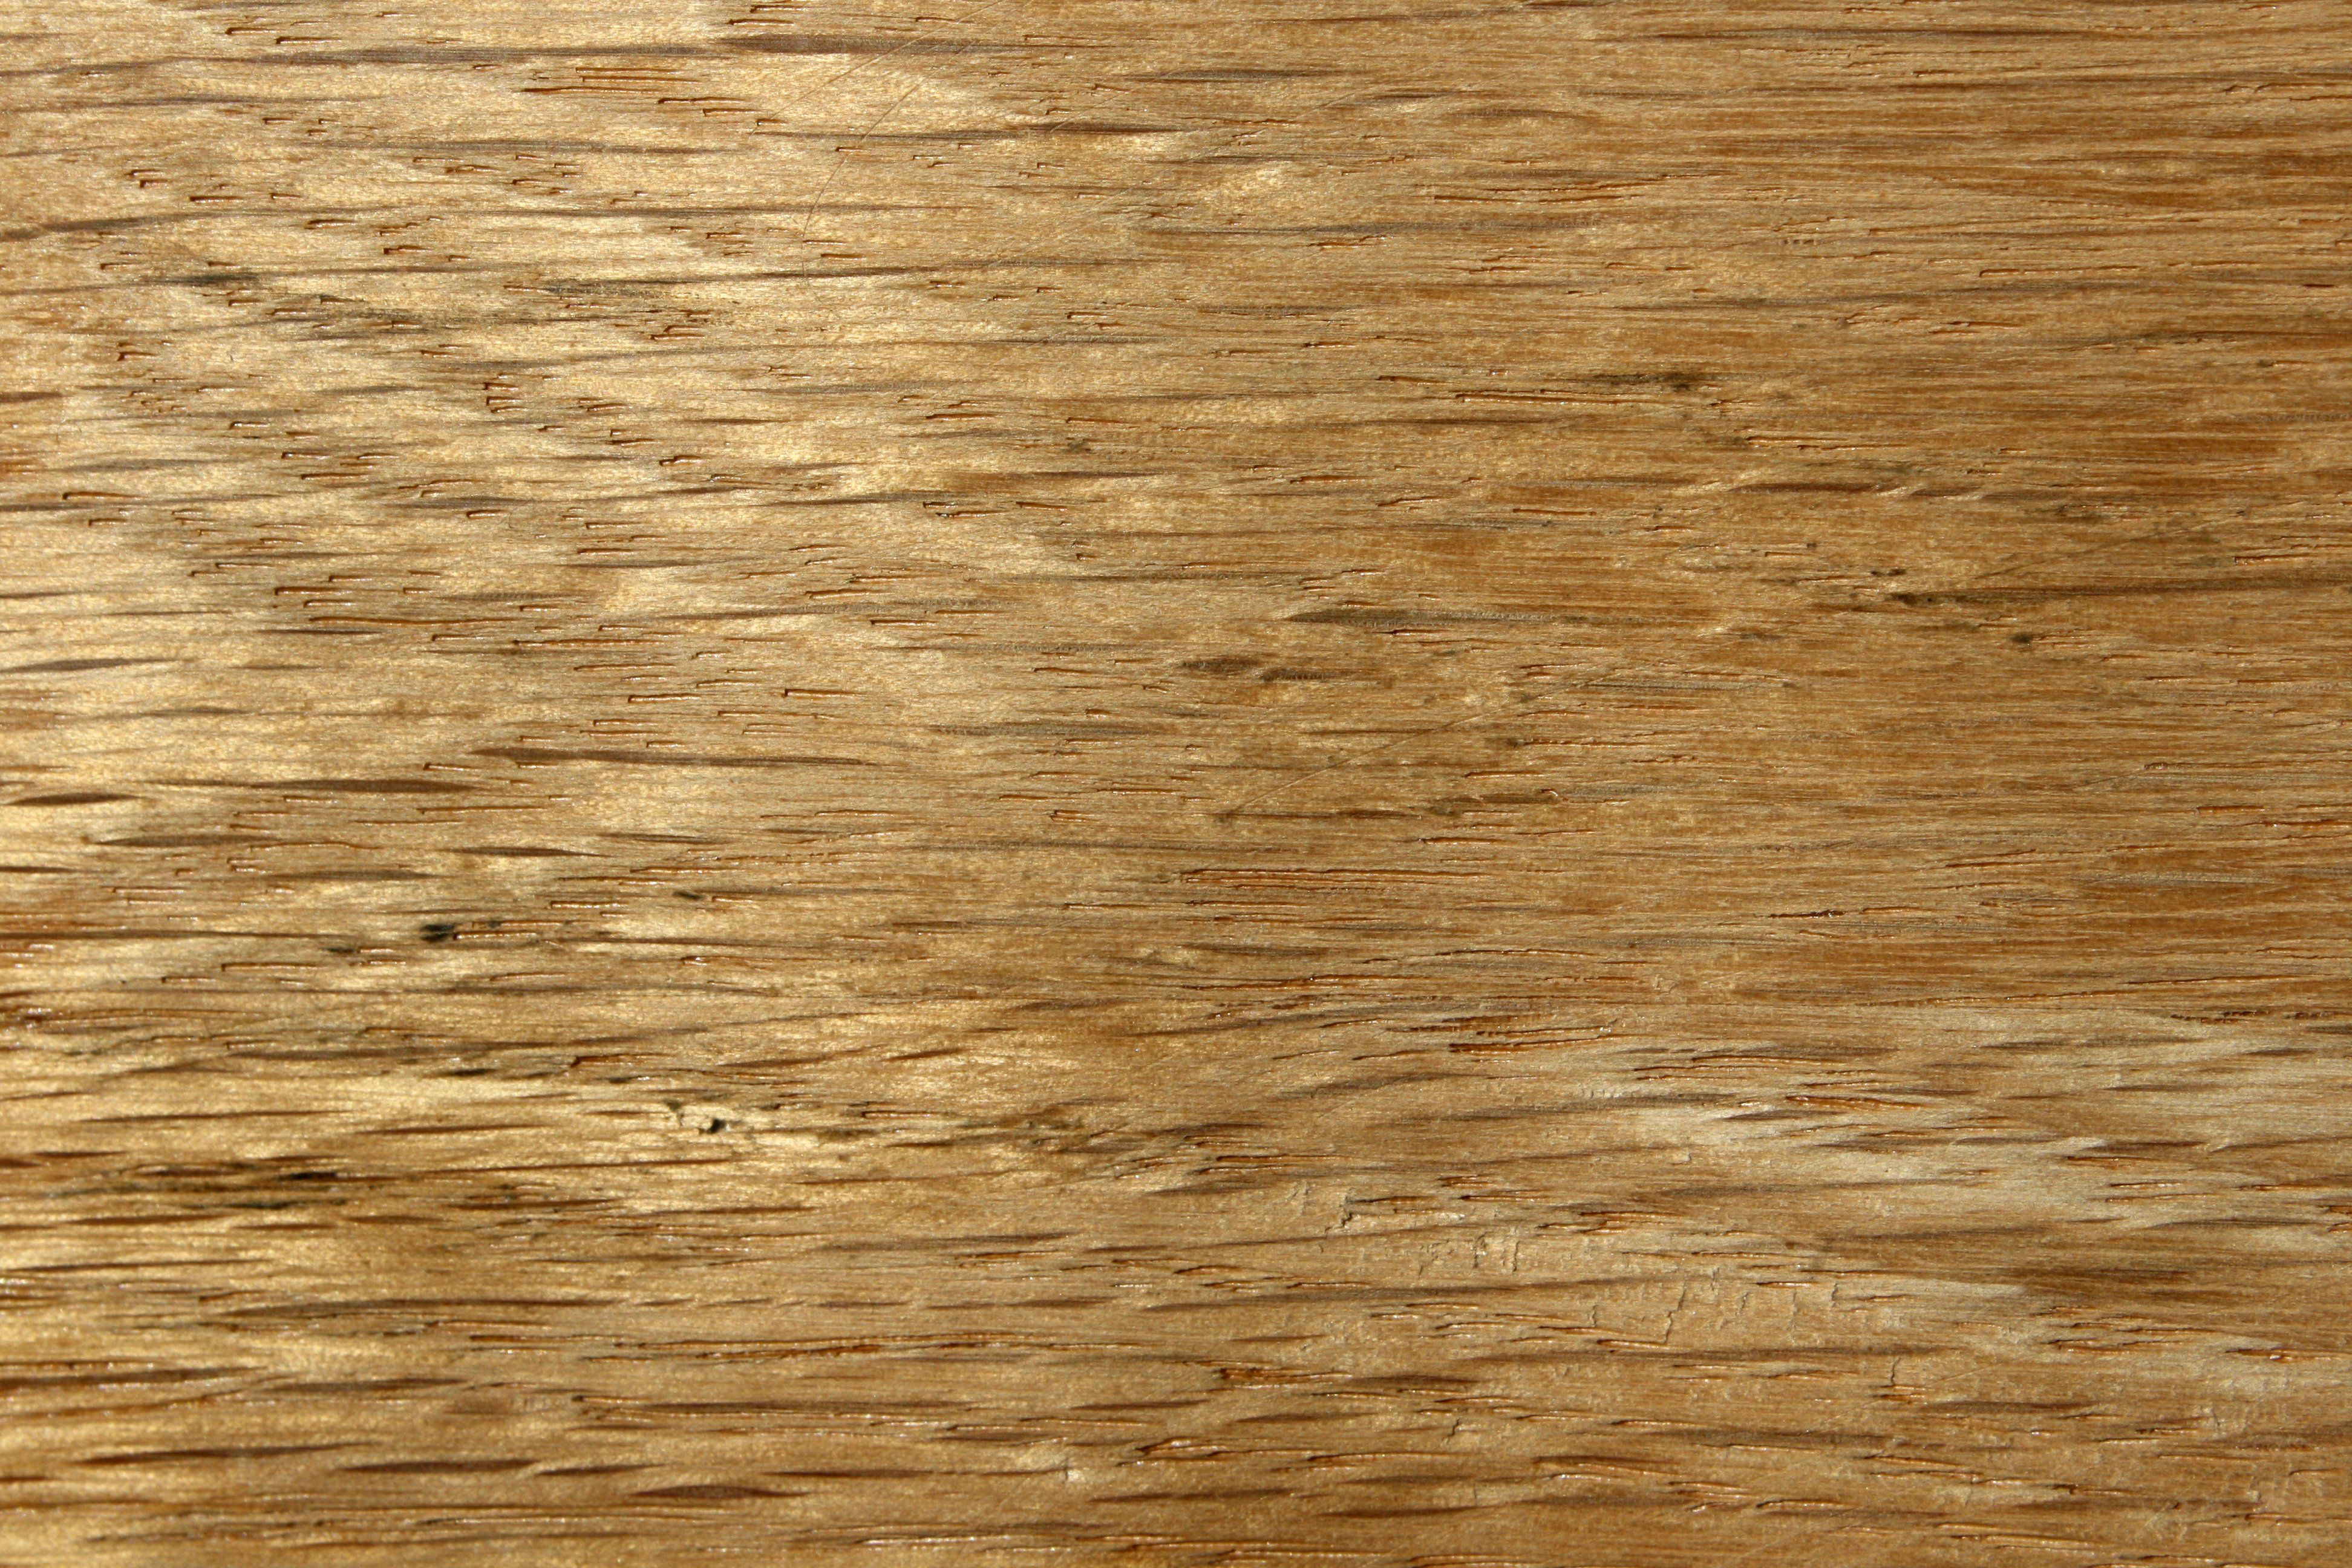 Wood Grain Pin It